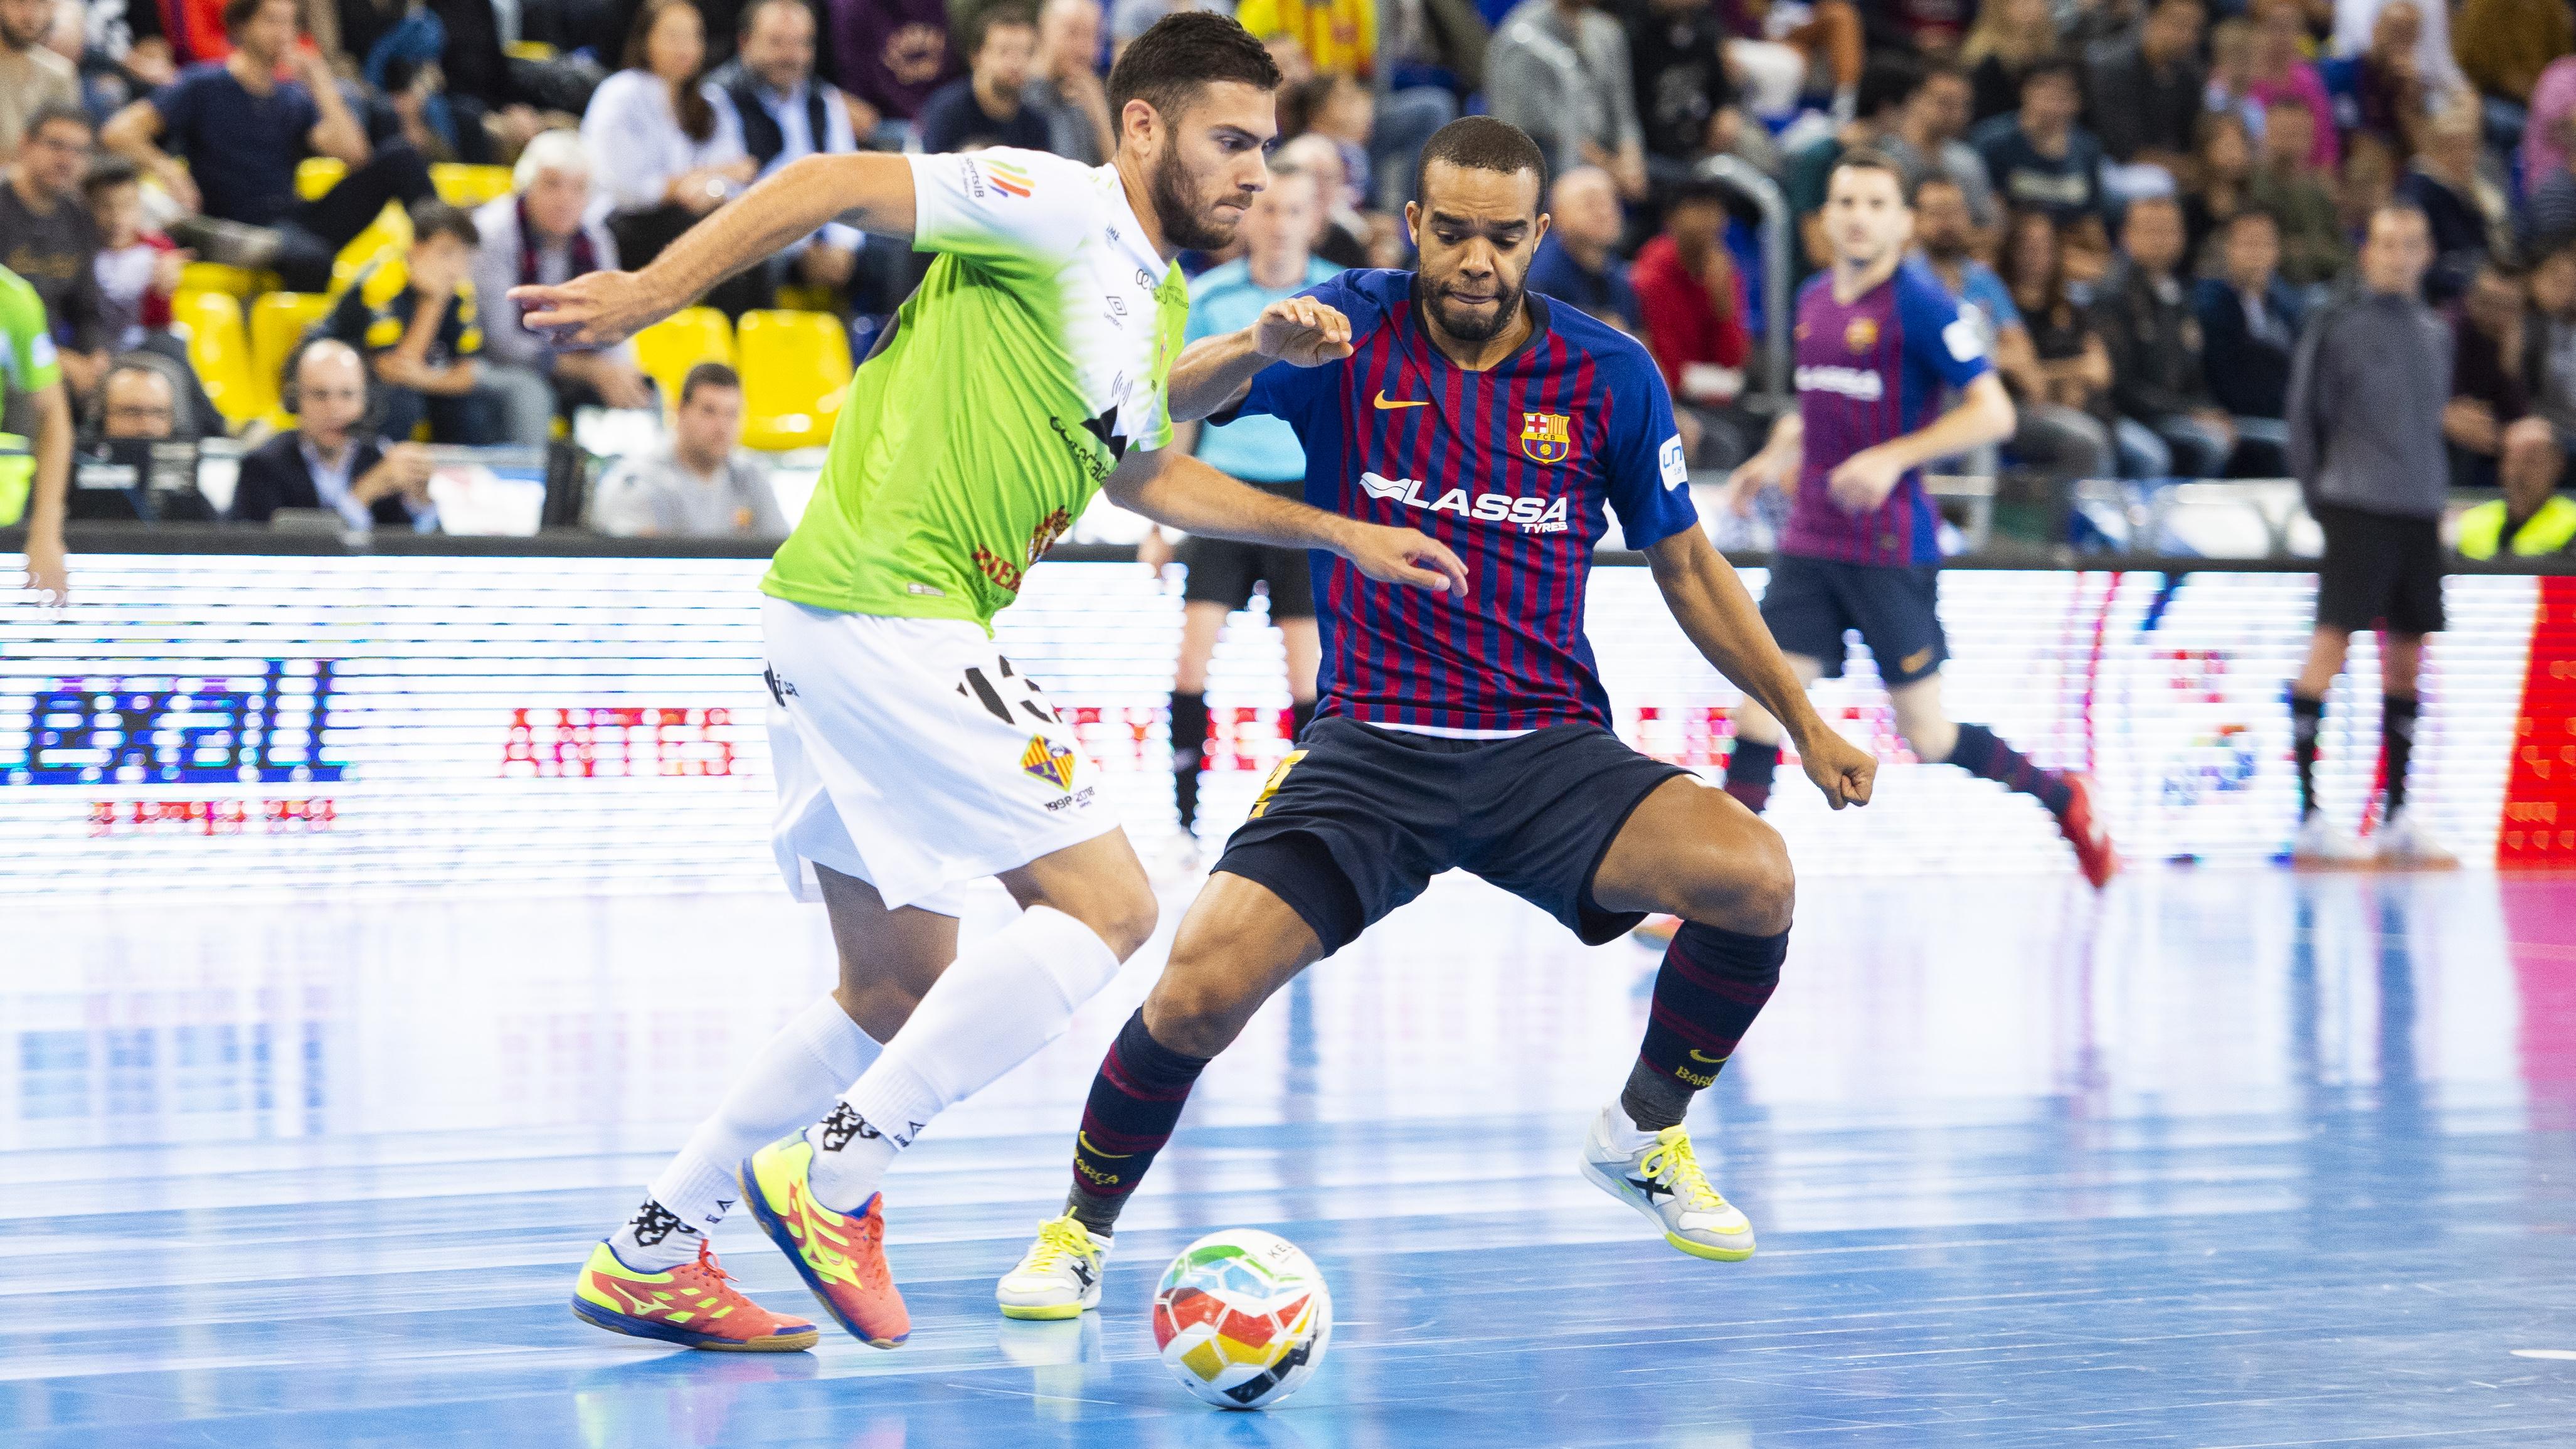 2018-11-10_FCB futsal vs PALMA_VICTOR